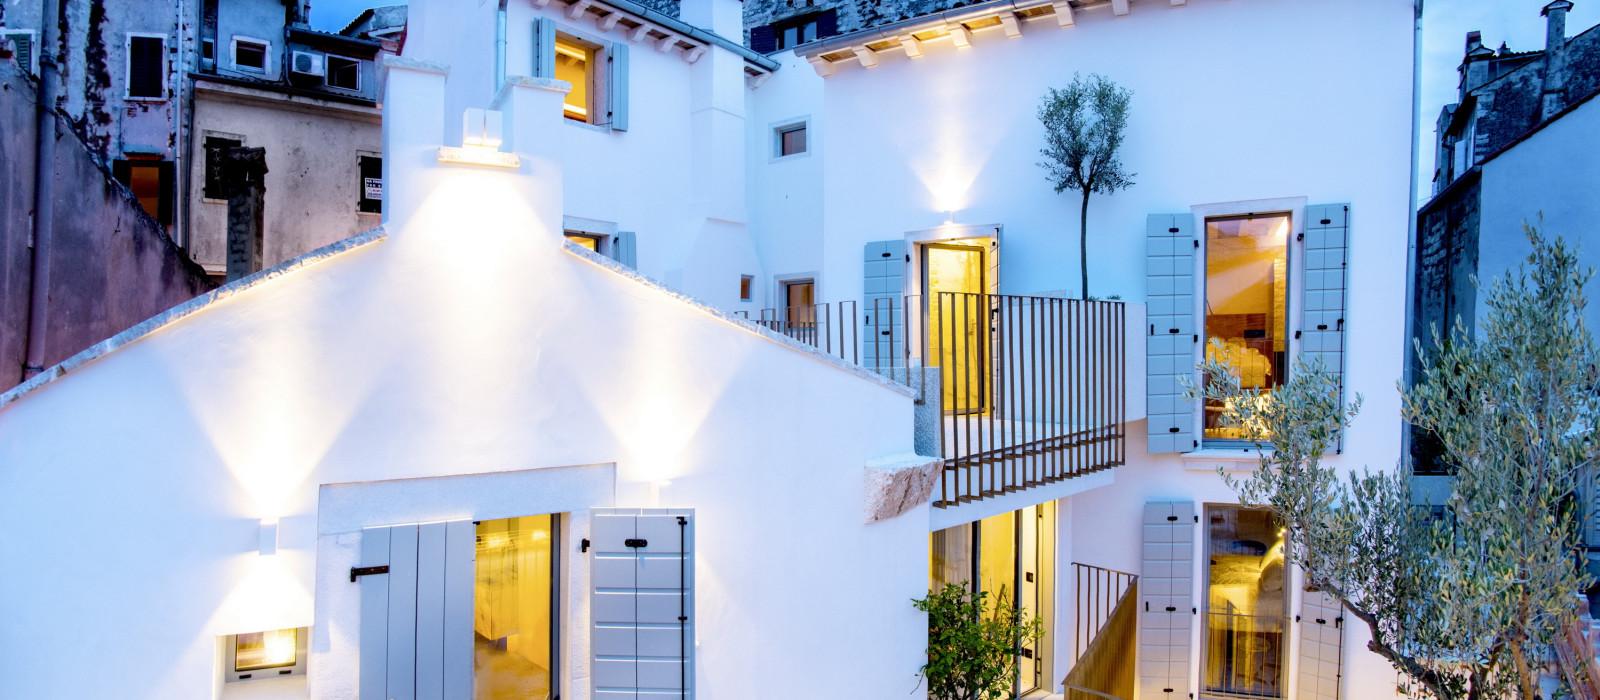 Hotel Spirito Santo Palazzo Storico Croatia & Slovenia